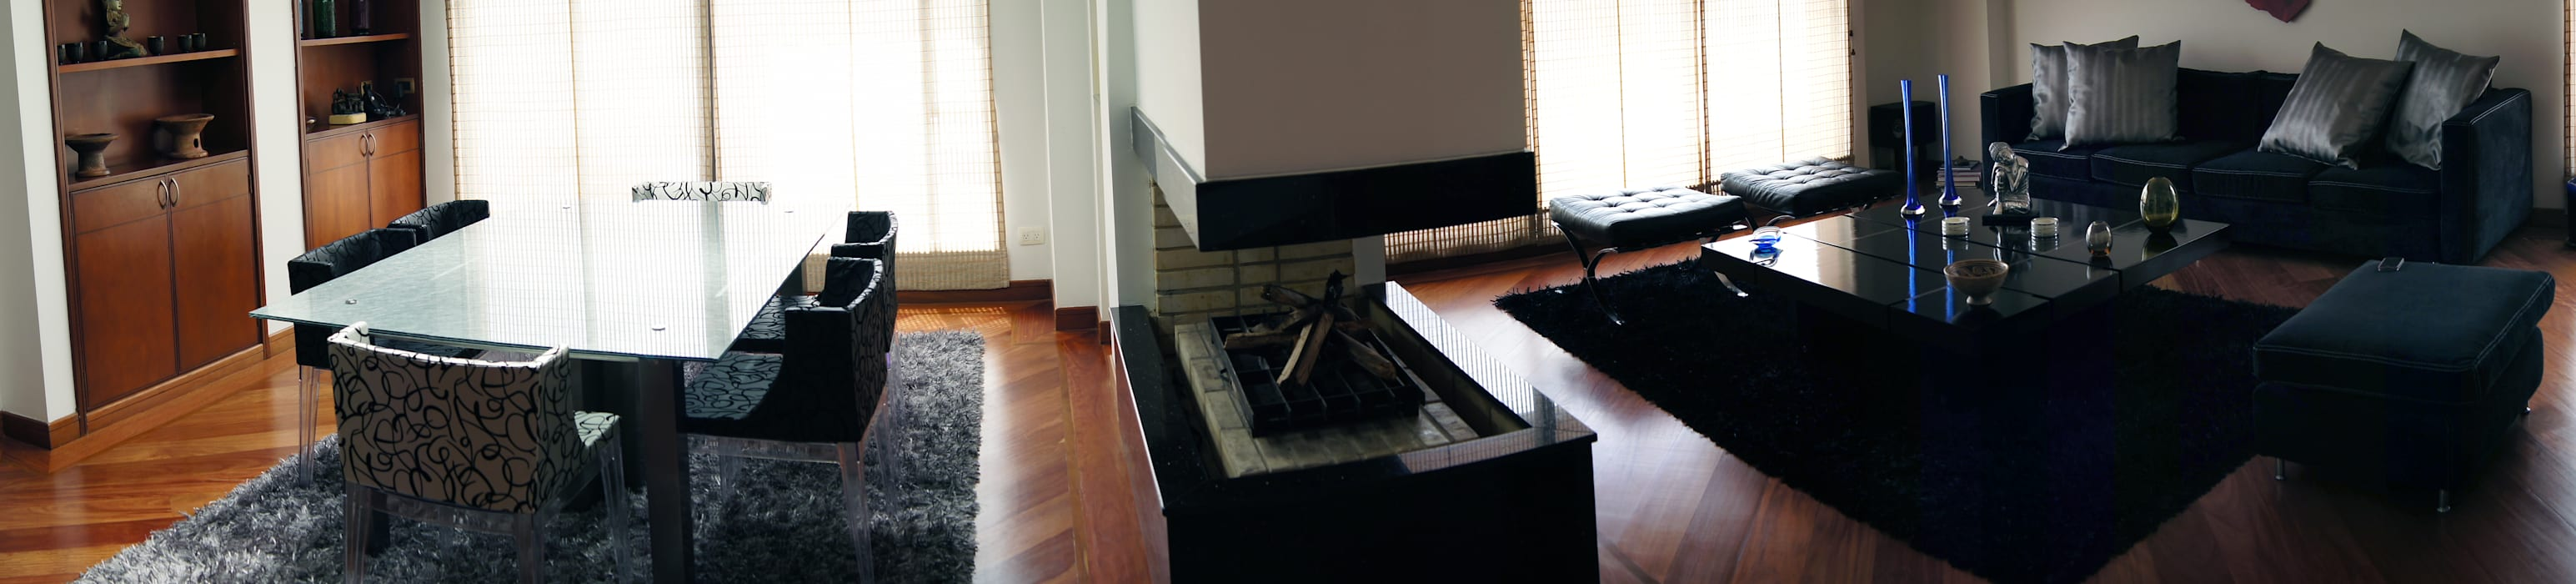 Gentleman  Apartament  ( apartamento para hombre soltero) : Comedores de estilo  por MARECO DESIGN S.A.S, Moderno